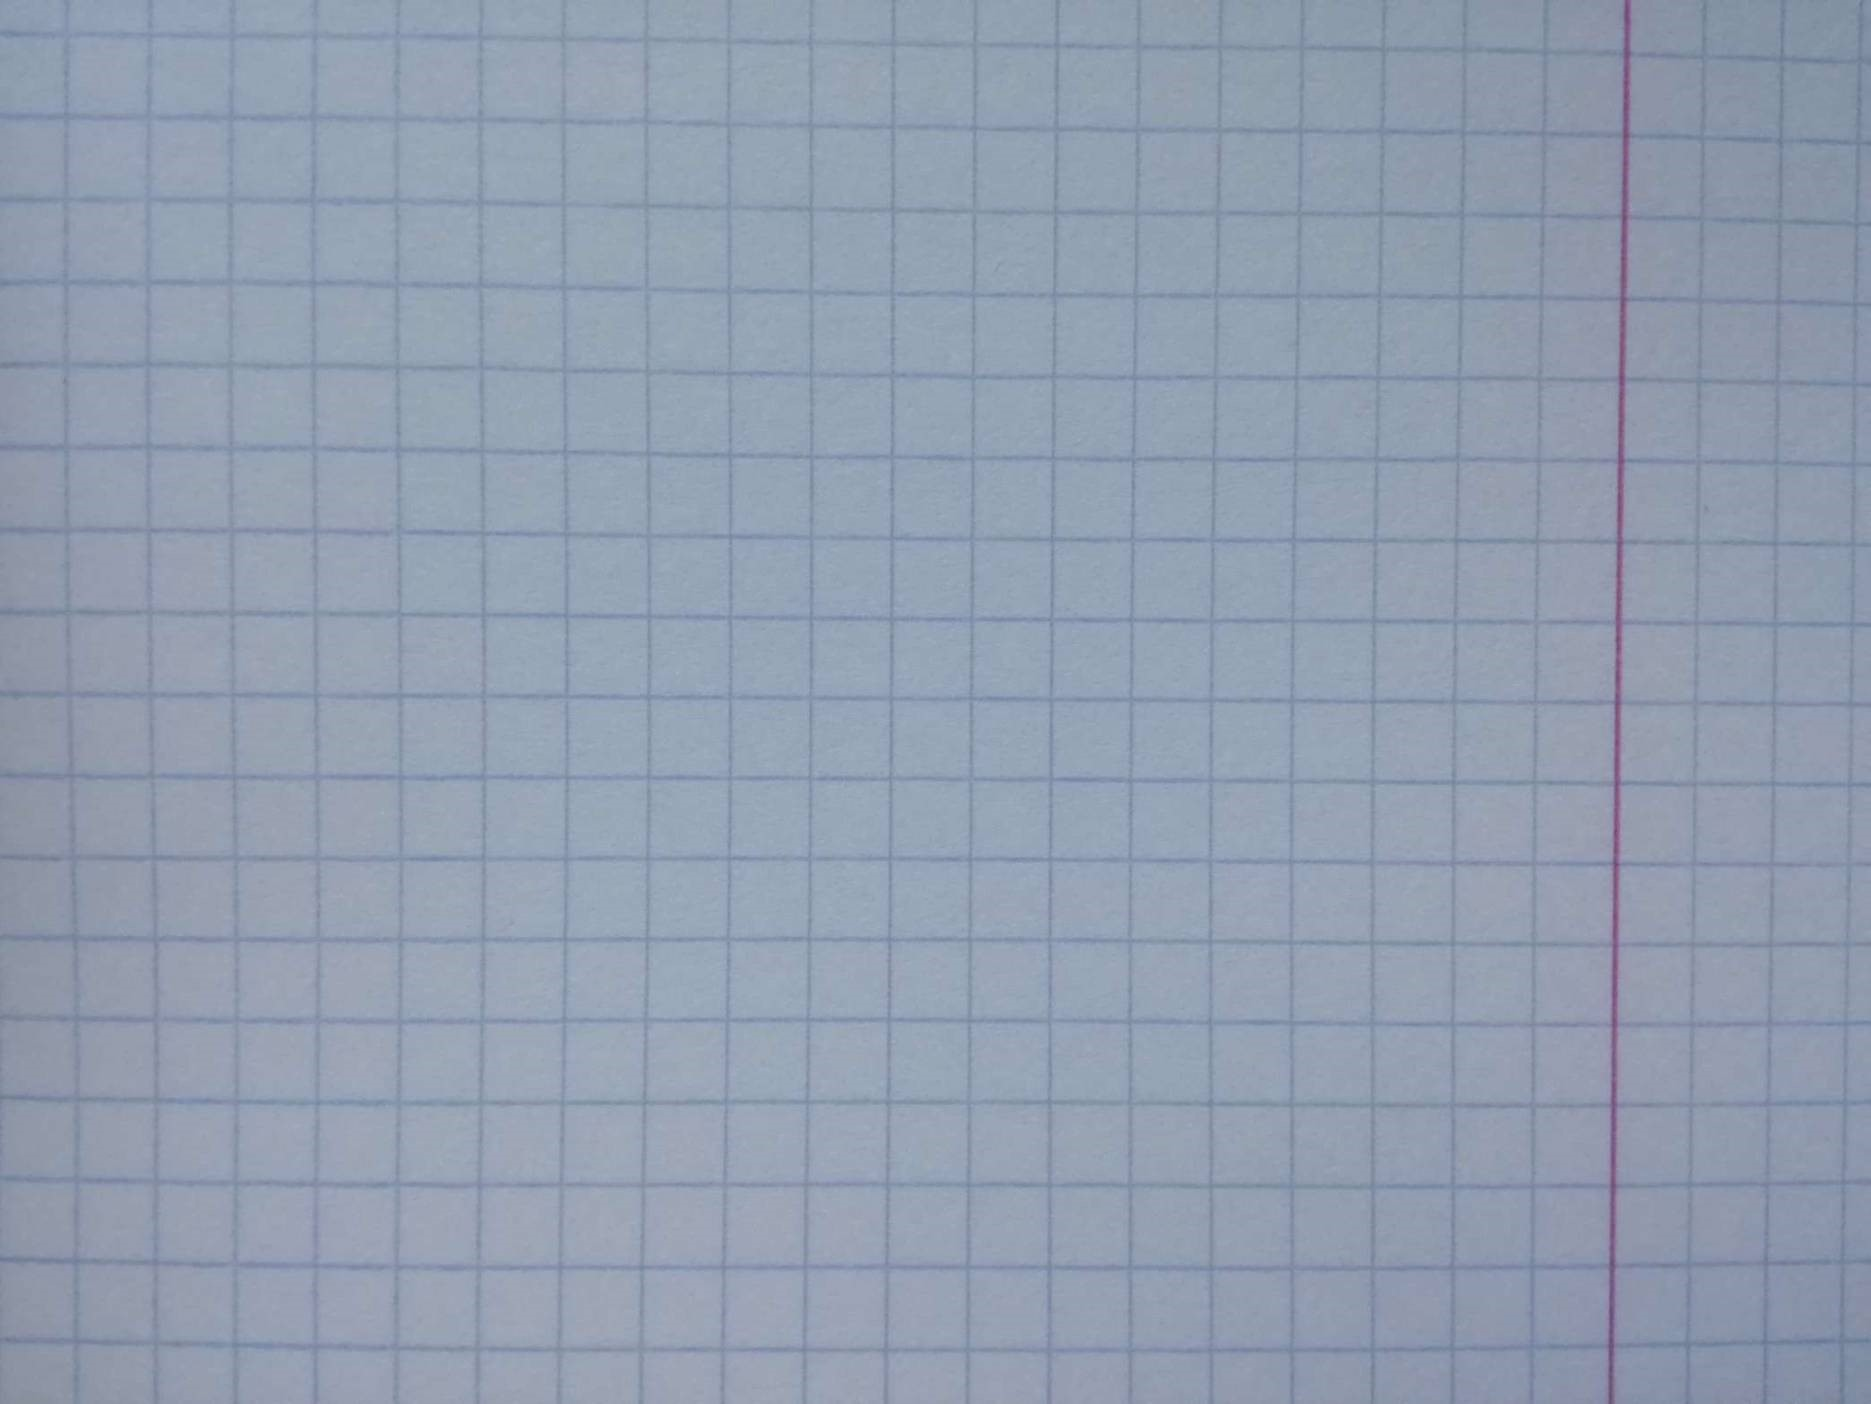 Картинка клеток тетради